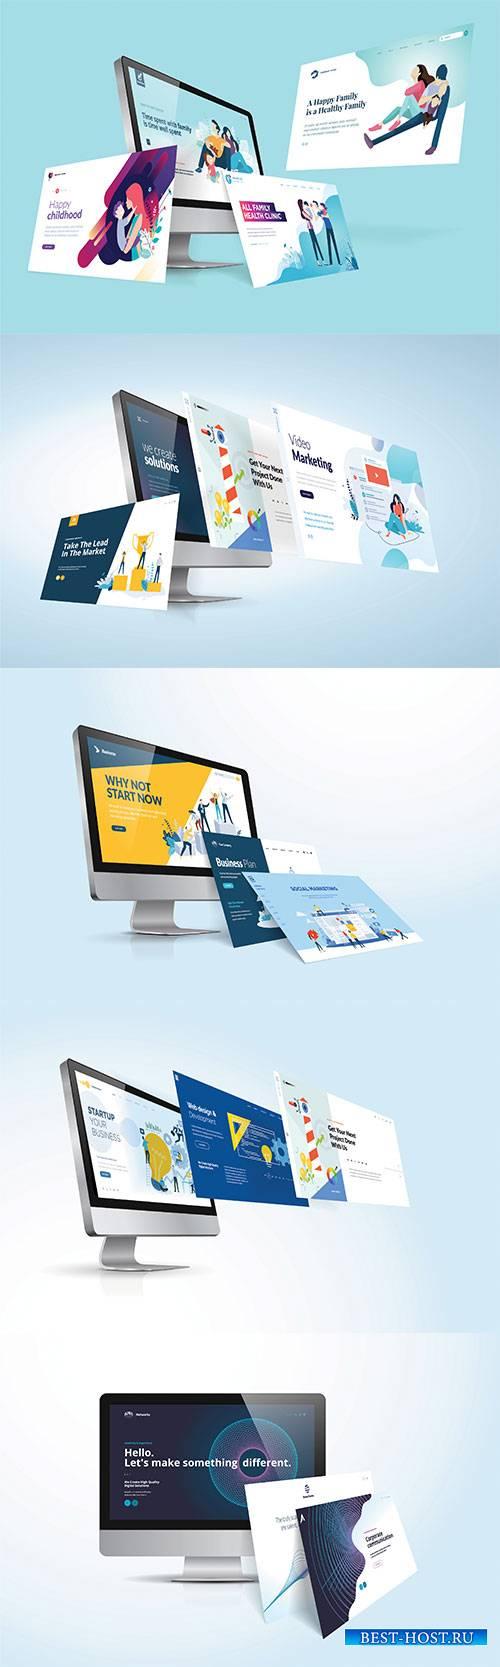 Vector illustration concept of website design and development